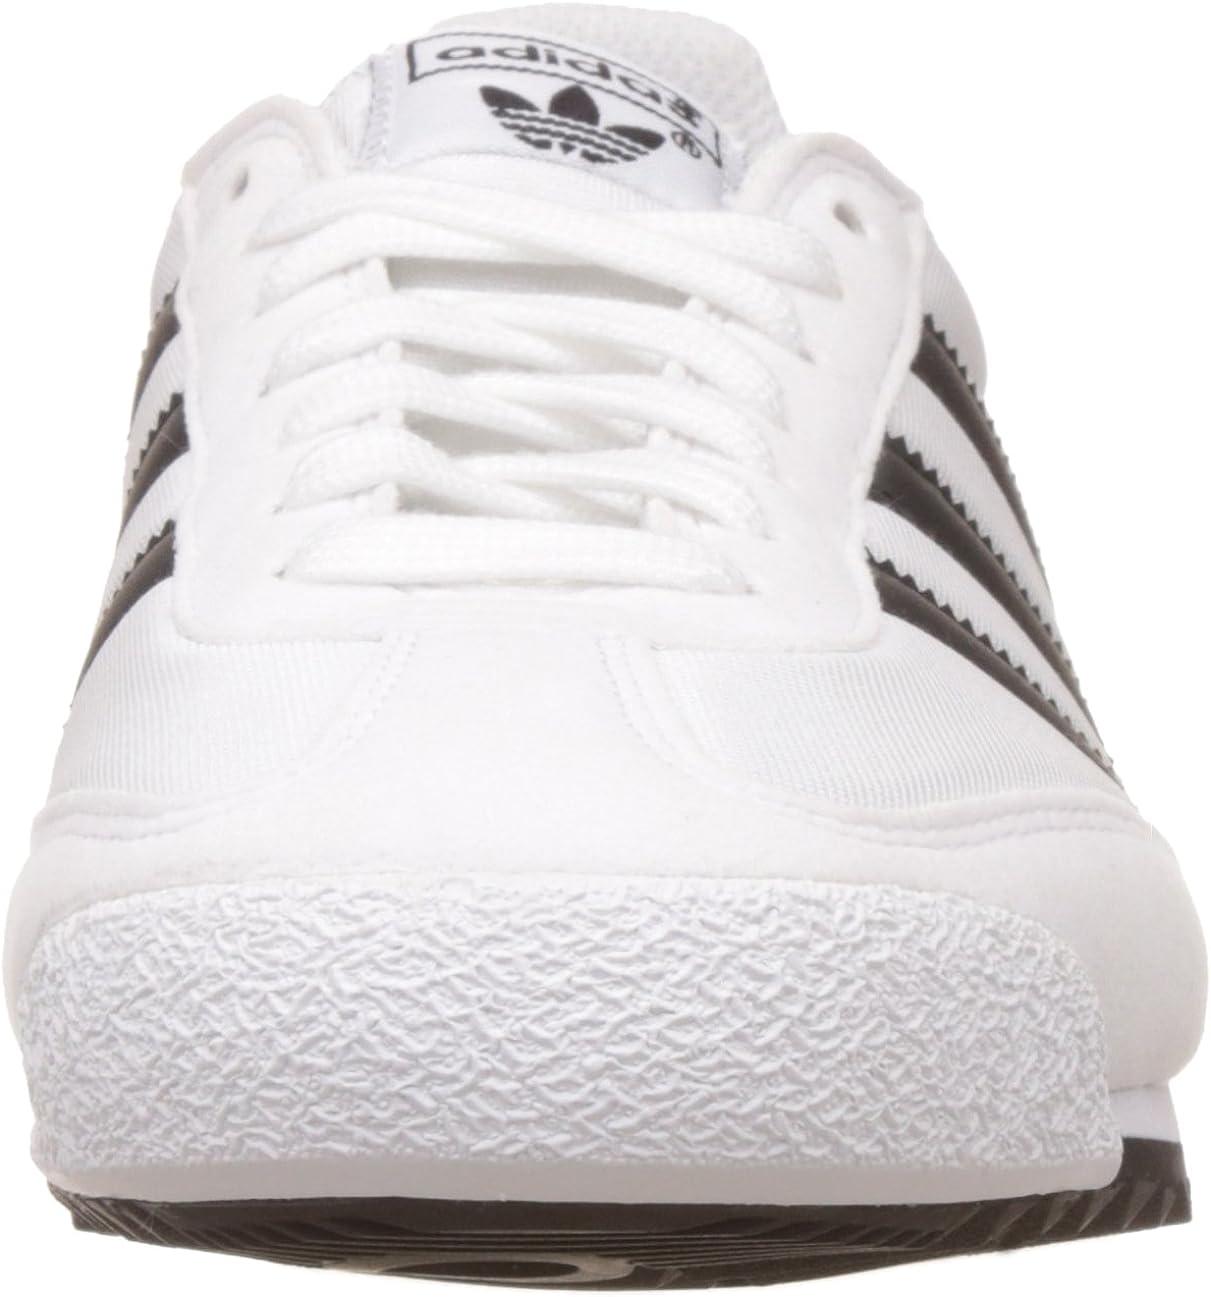 adidas Dragon Vintage, Baskets Basses Homme : Amazon.fr ...